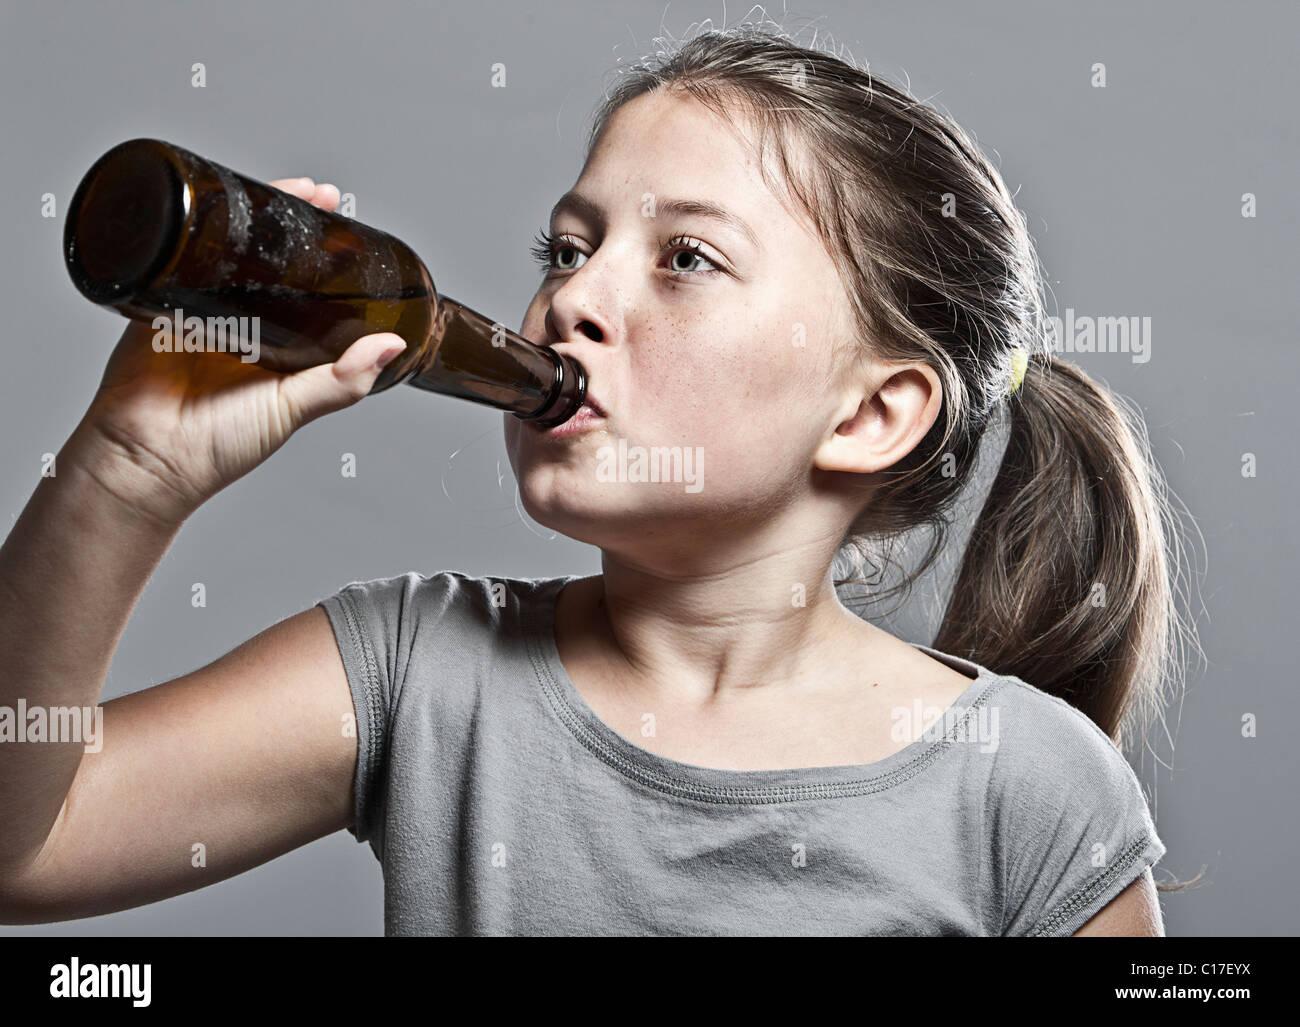 Teen Drinking Age 29